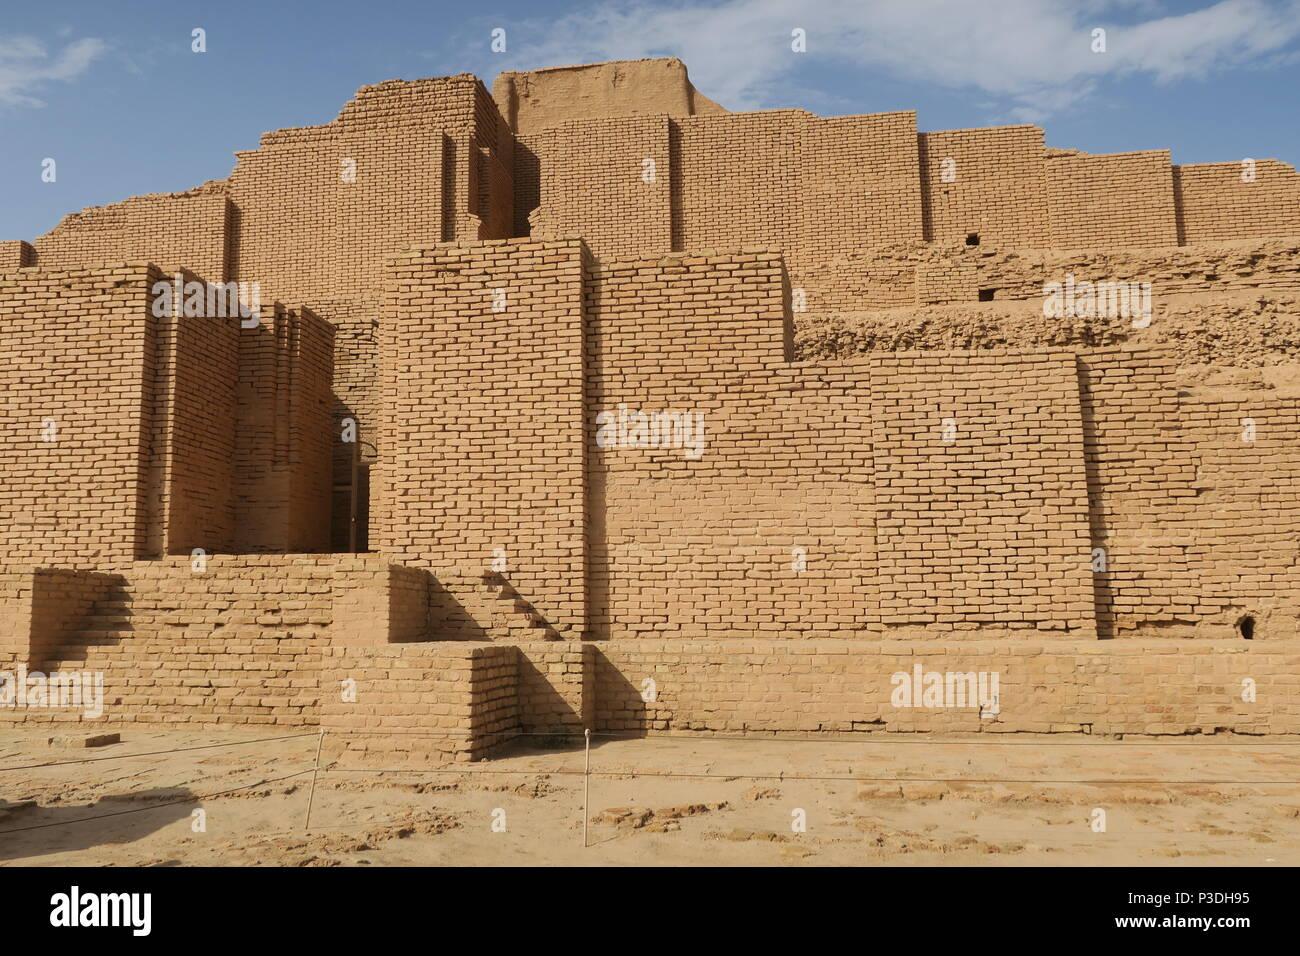 Chogha Zanbil, ancient Elamite complex in Khuzestan province